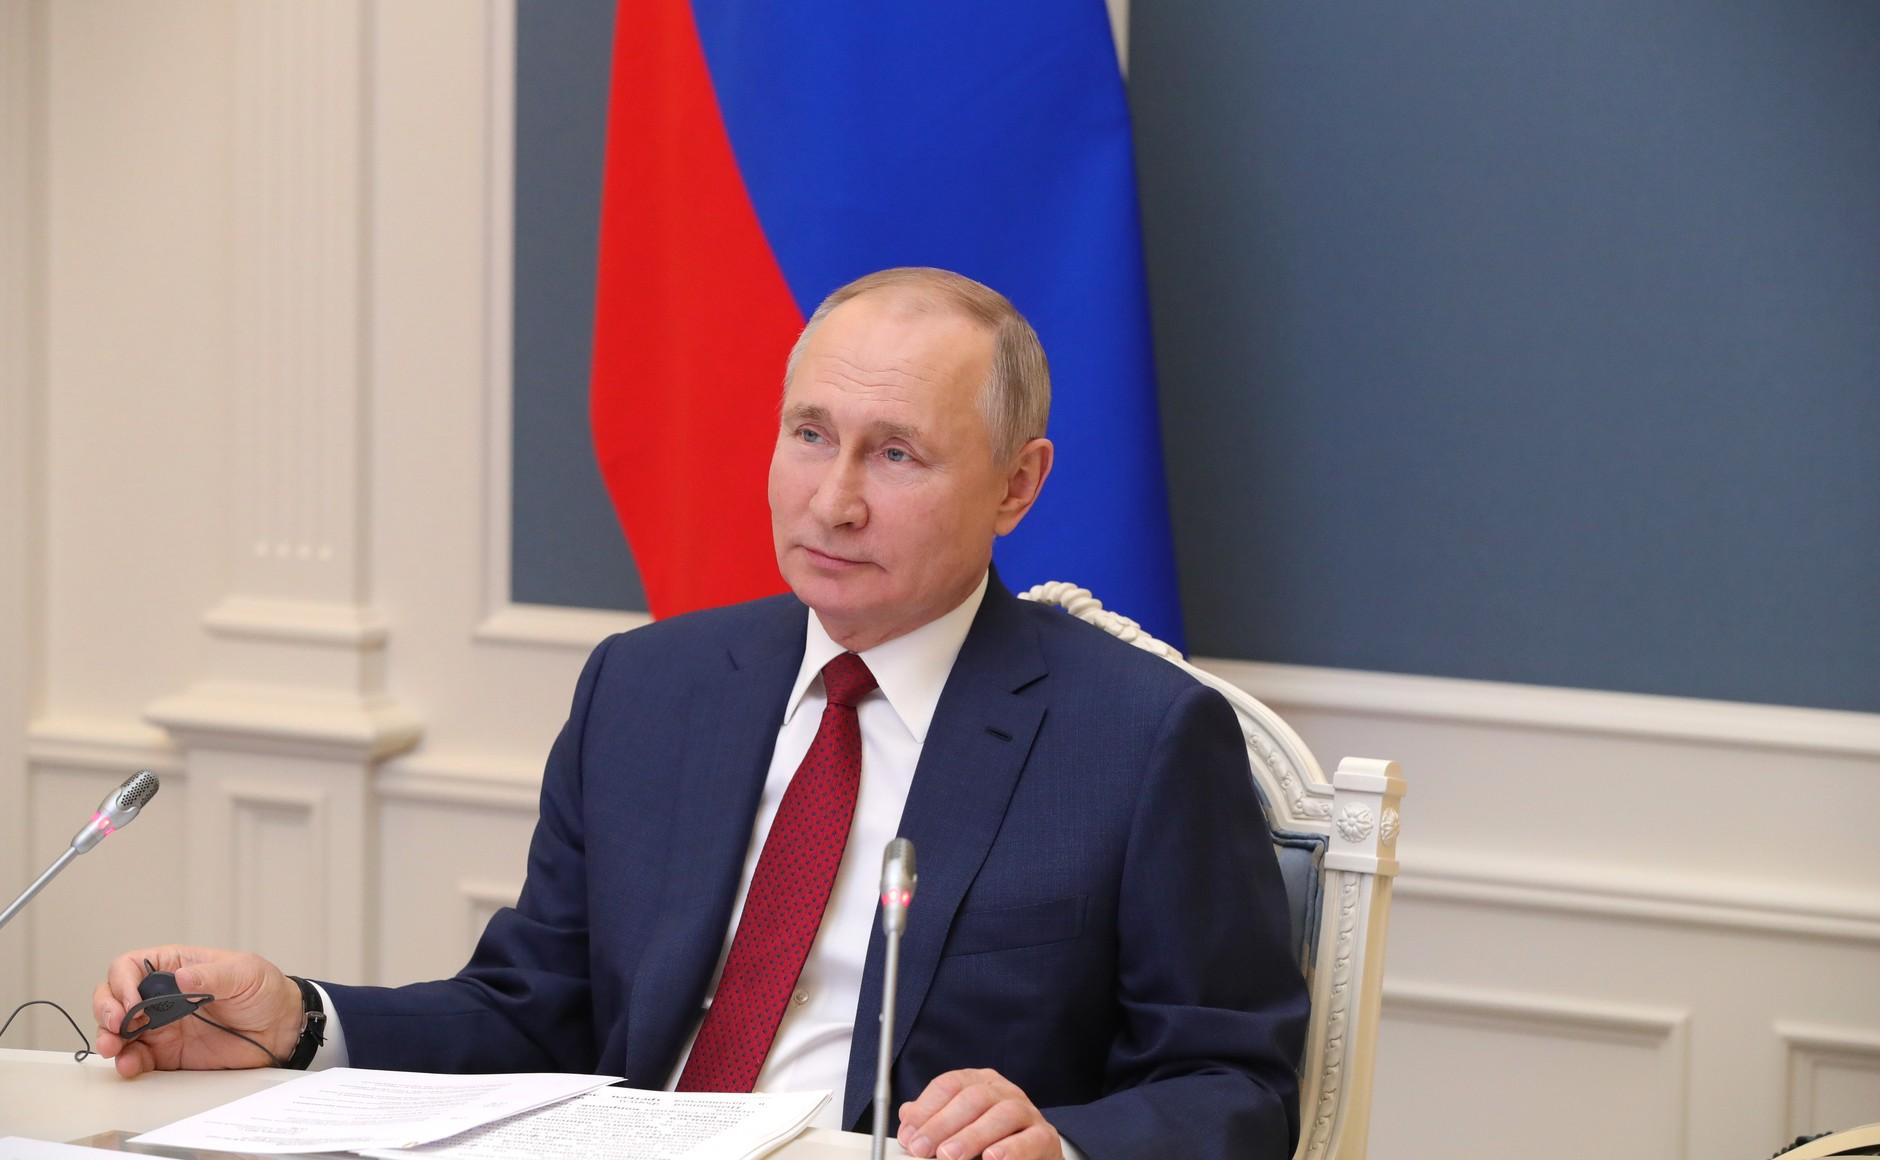 putyin_2021-01-27_davos.jpg